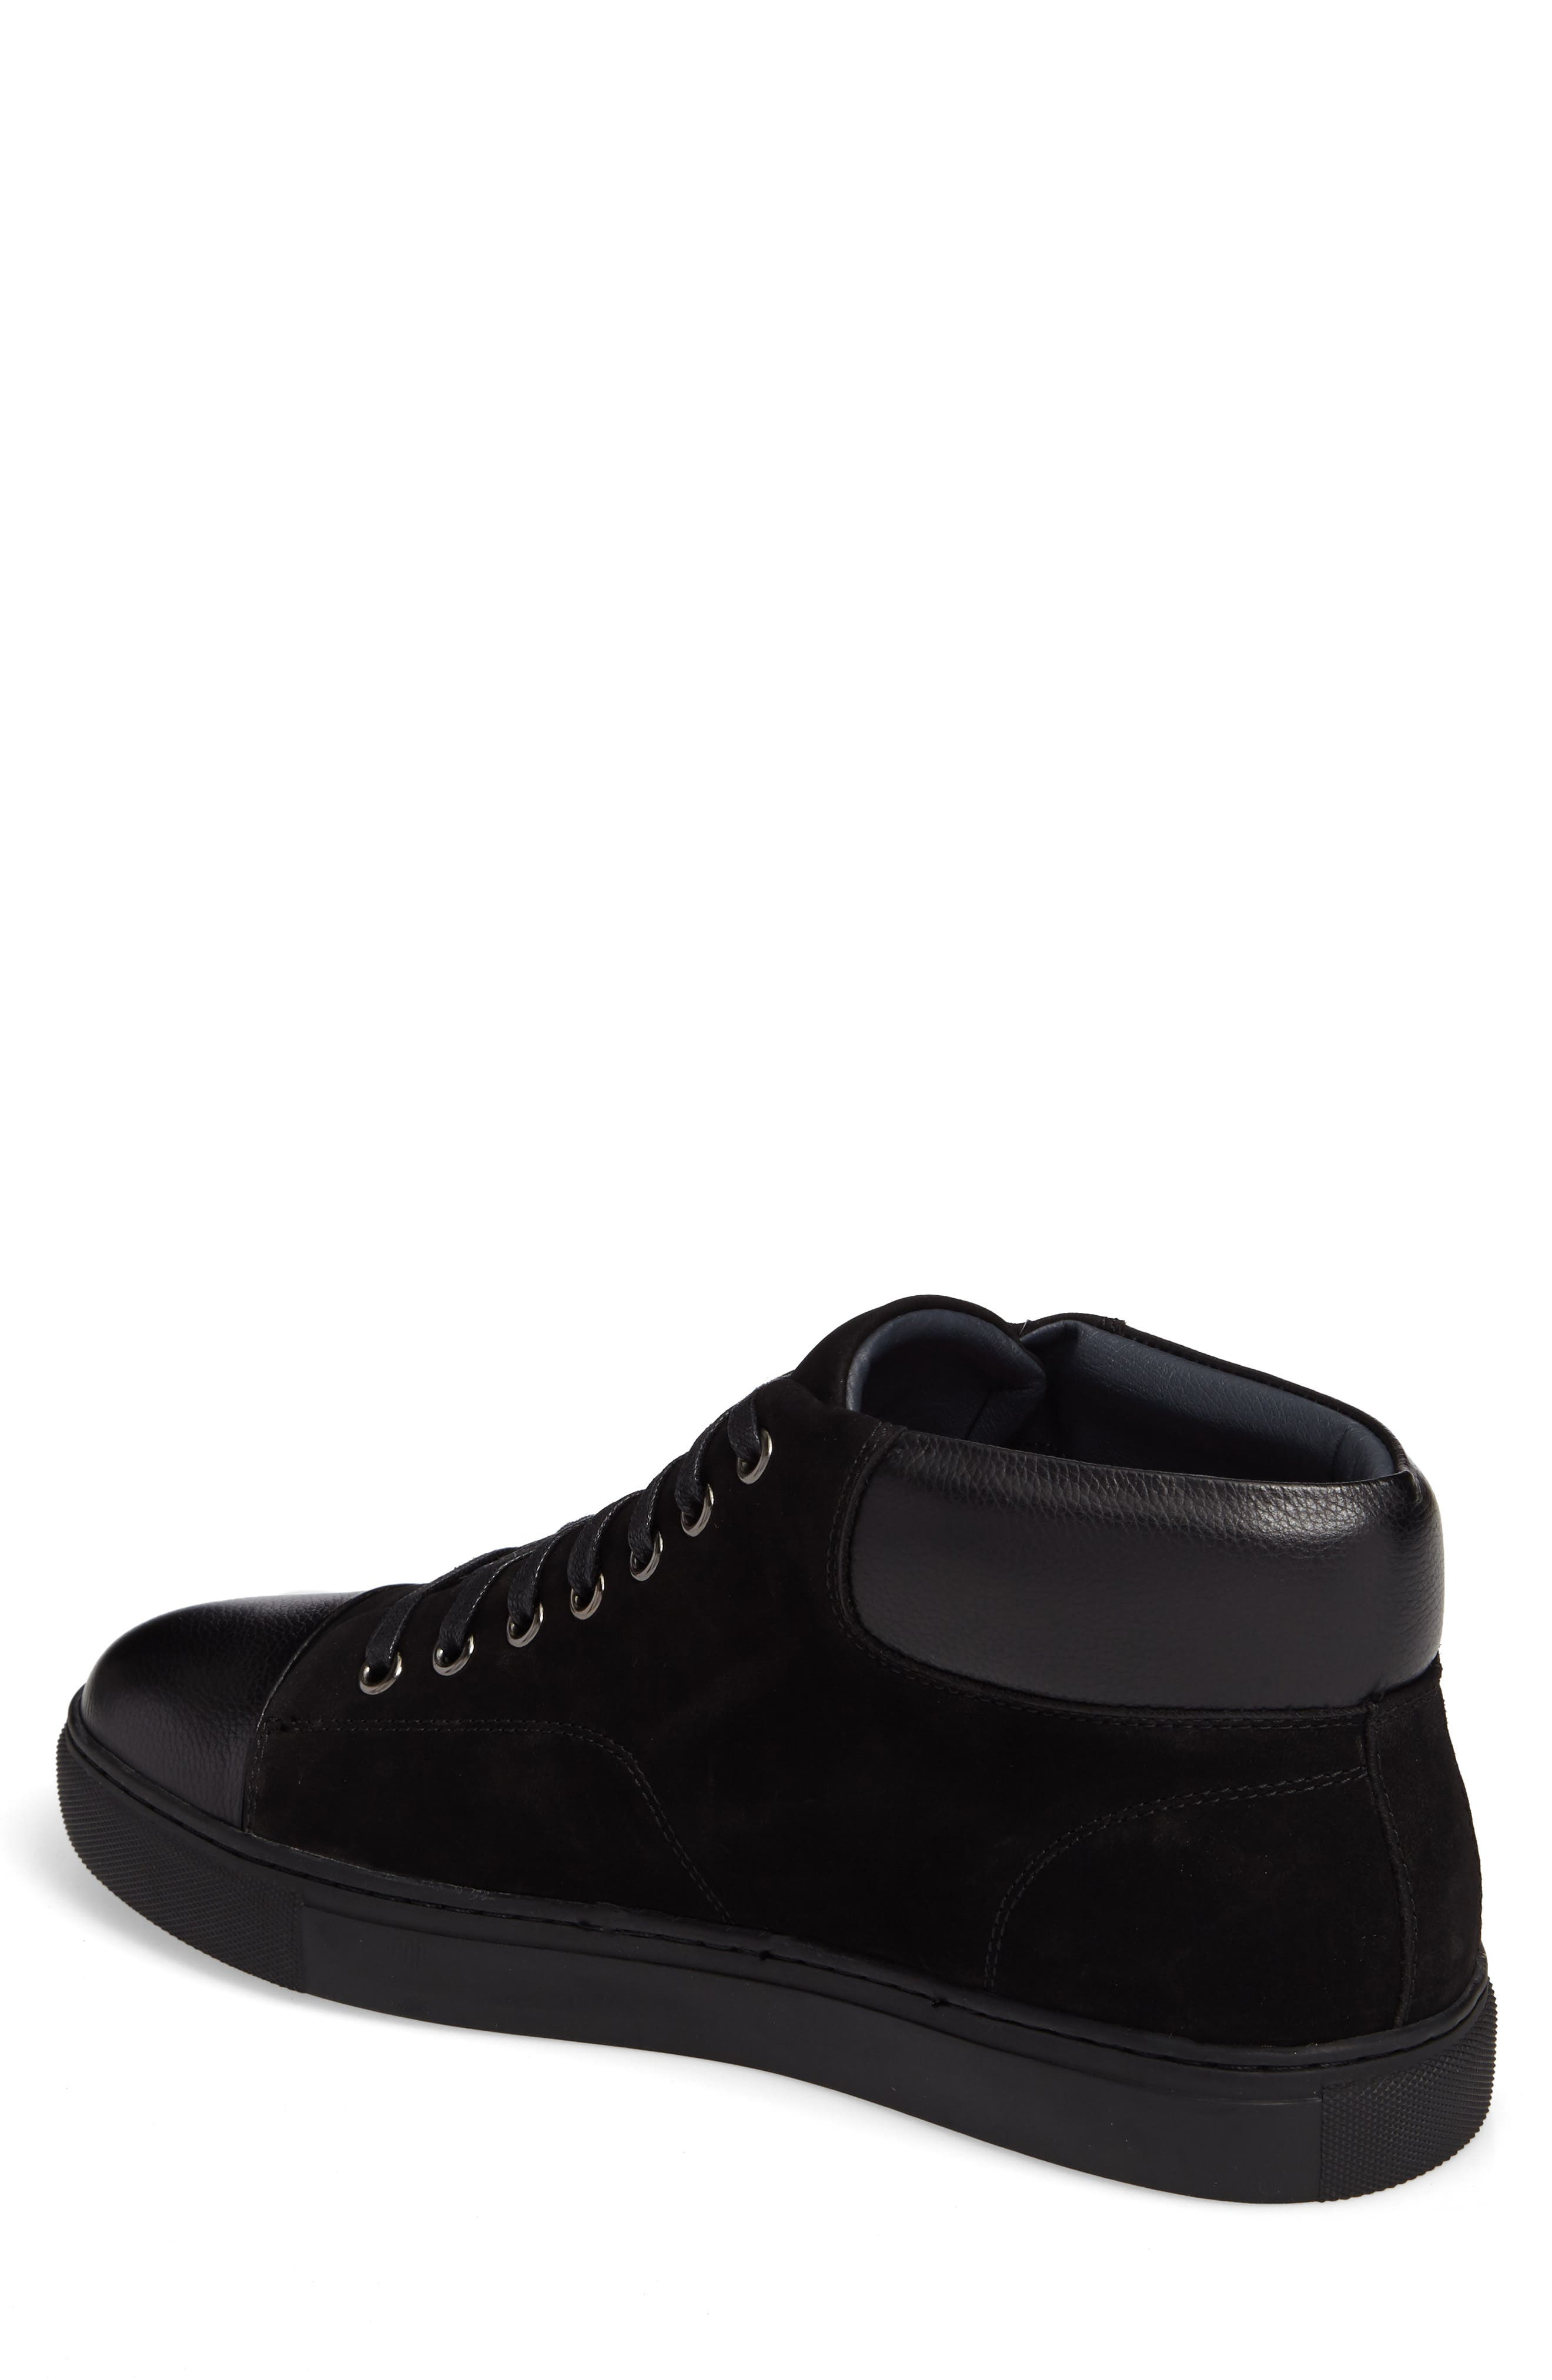 Landseer Sneaker,                             Alternate thumbnail 2, color,                             001